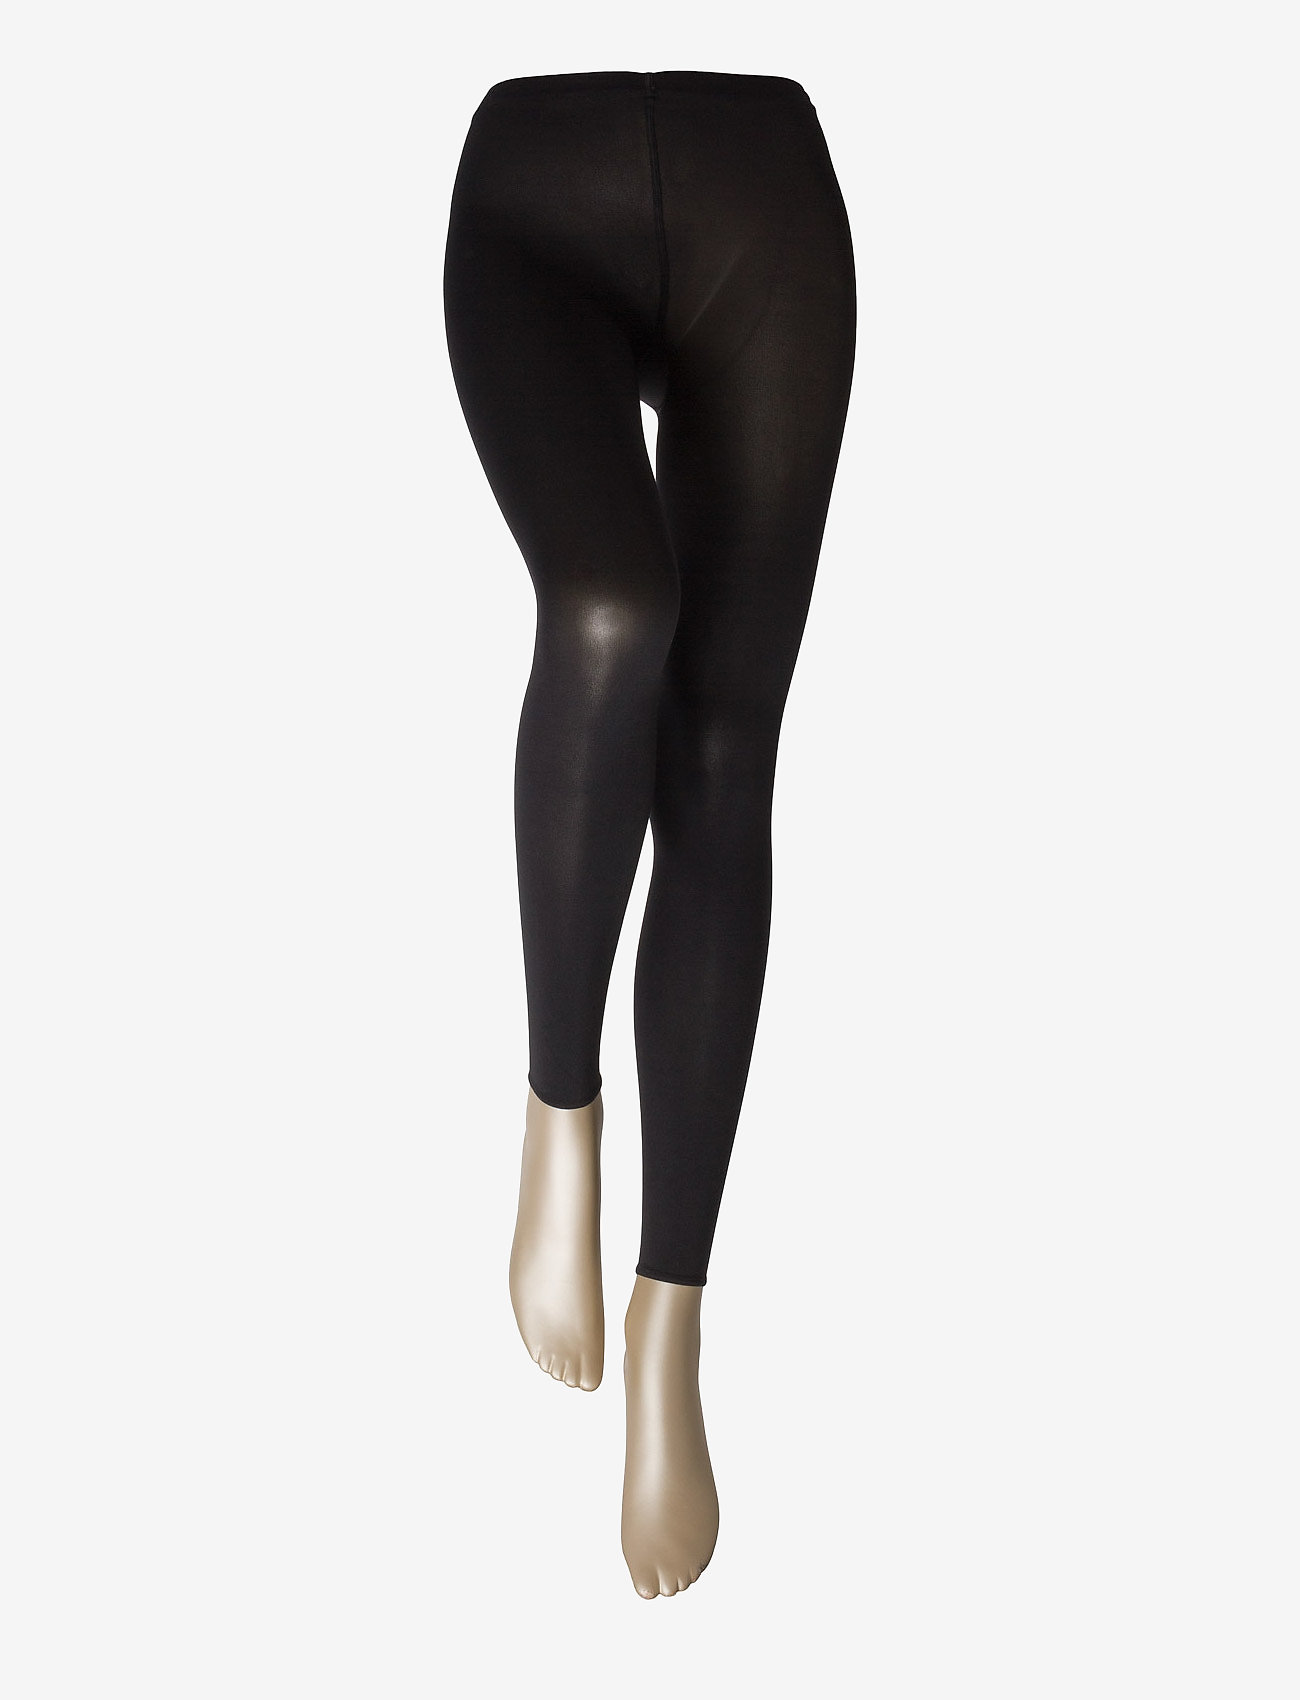 Wolford Velvet 66 Leggings - Strumpor & Tights Black